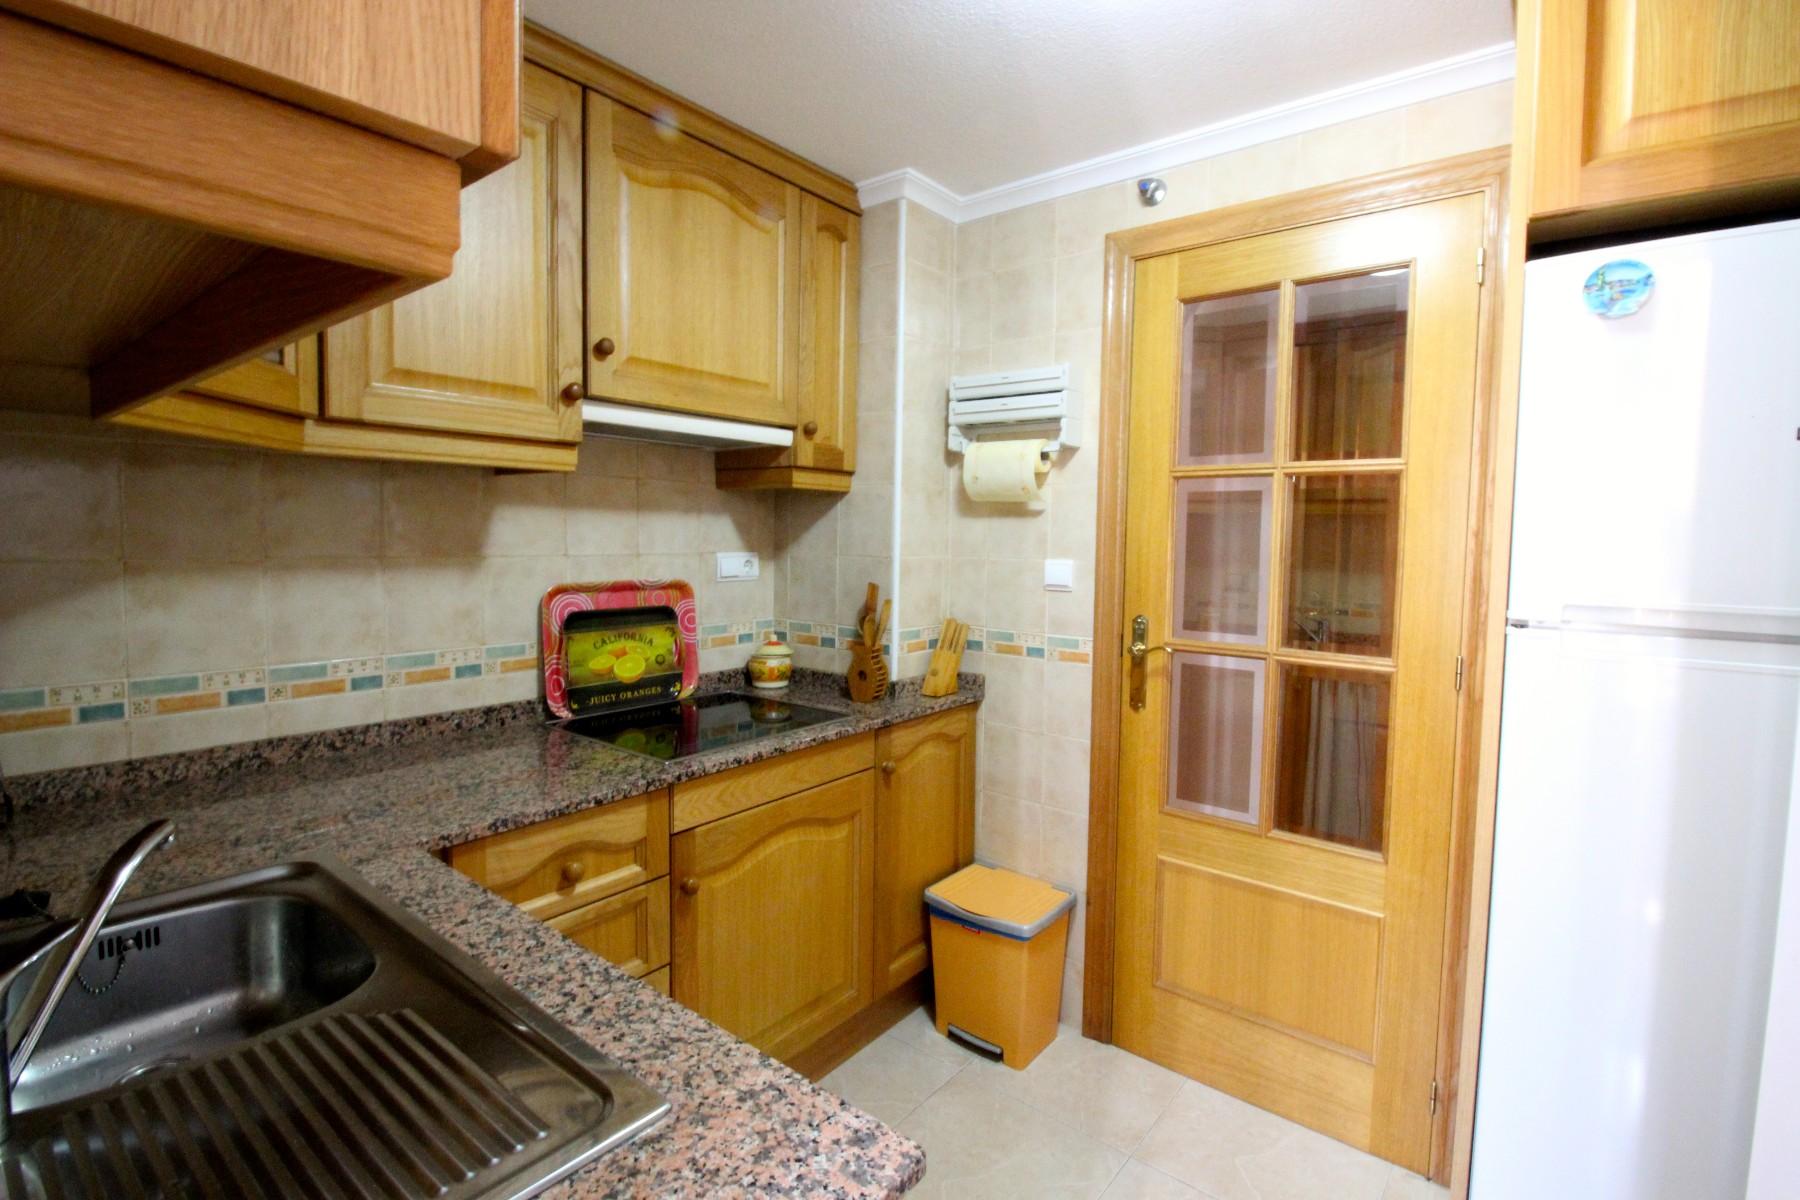 2 bedroom Apartment in Guardamar del Segura - Short Term Rentals in Nexus Grupo